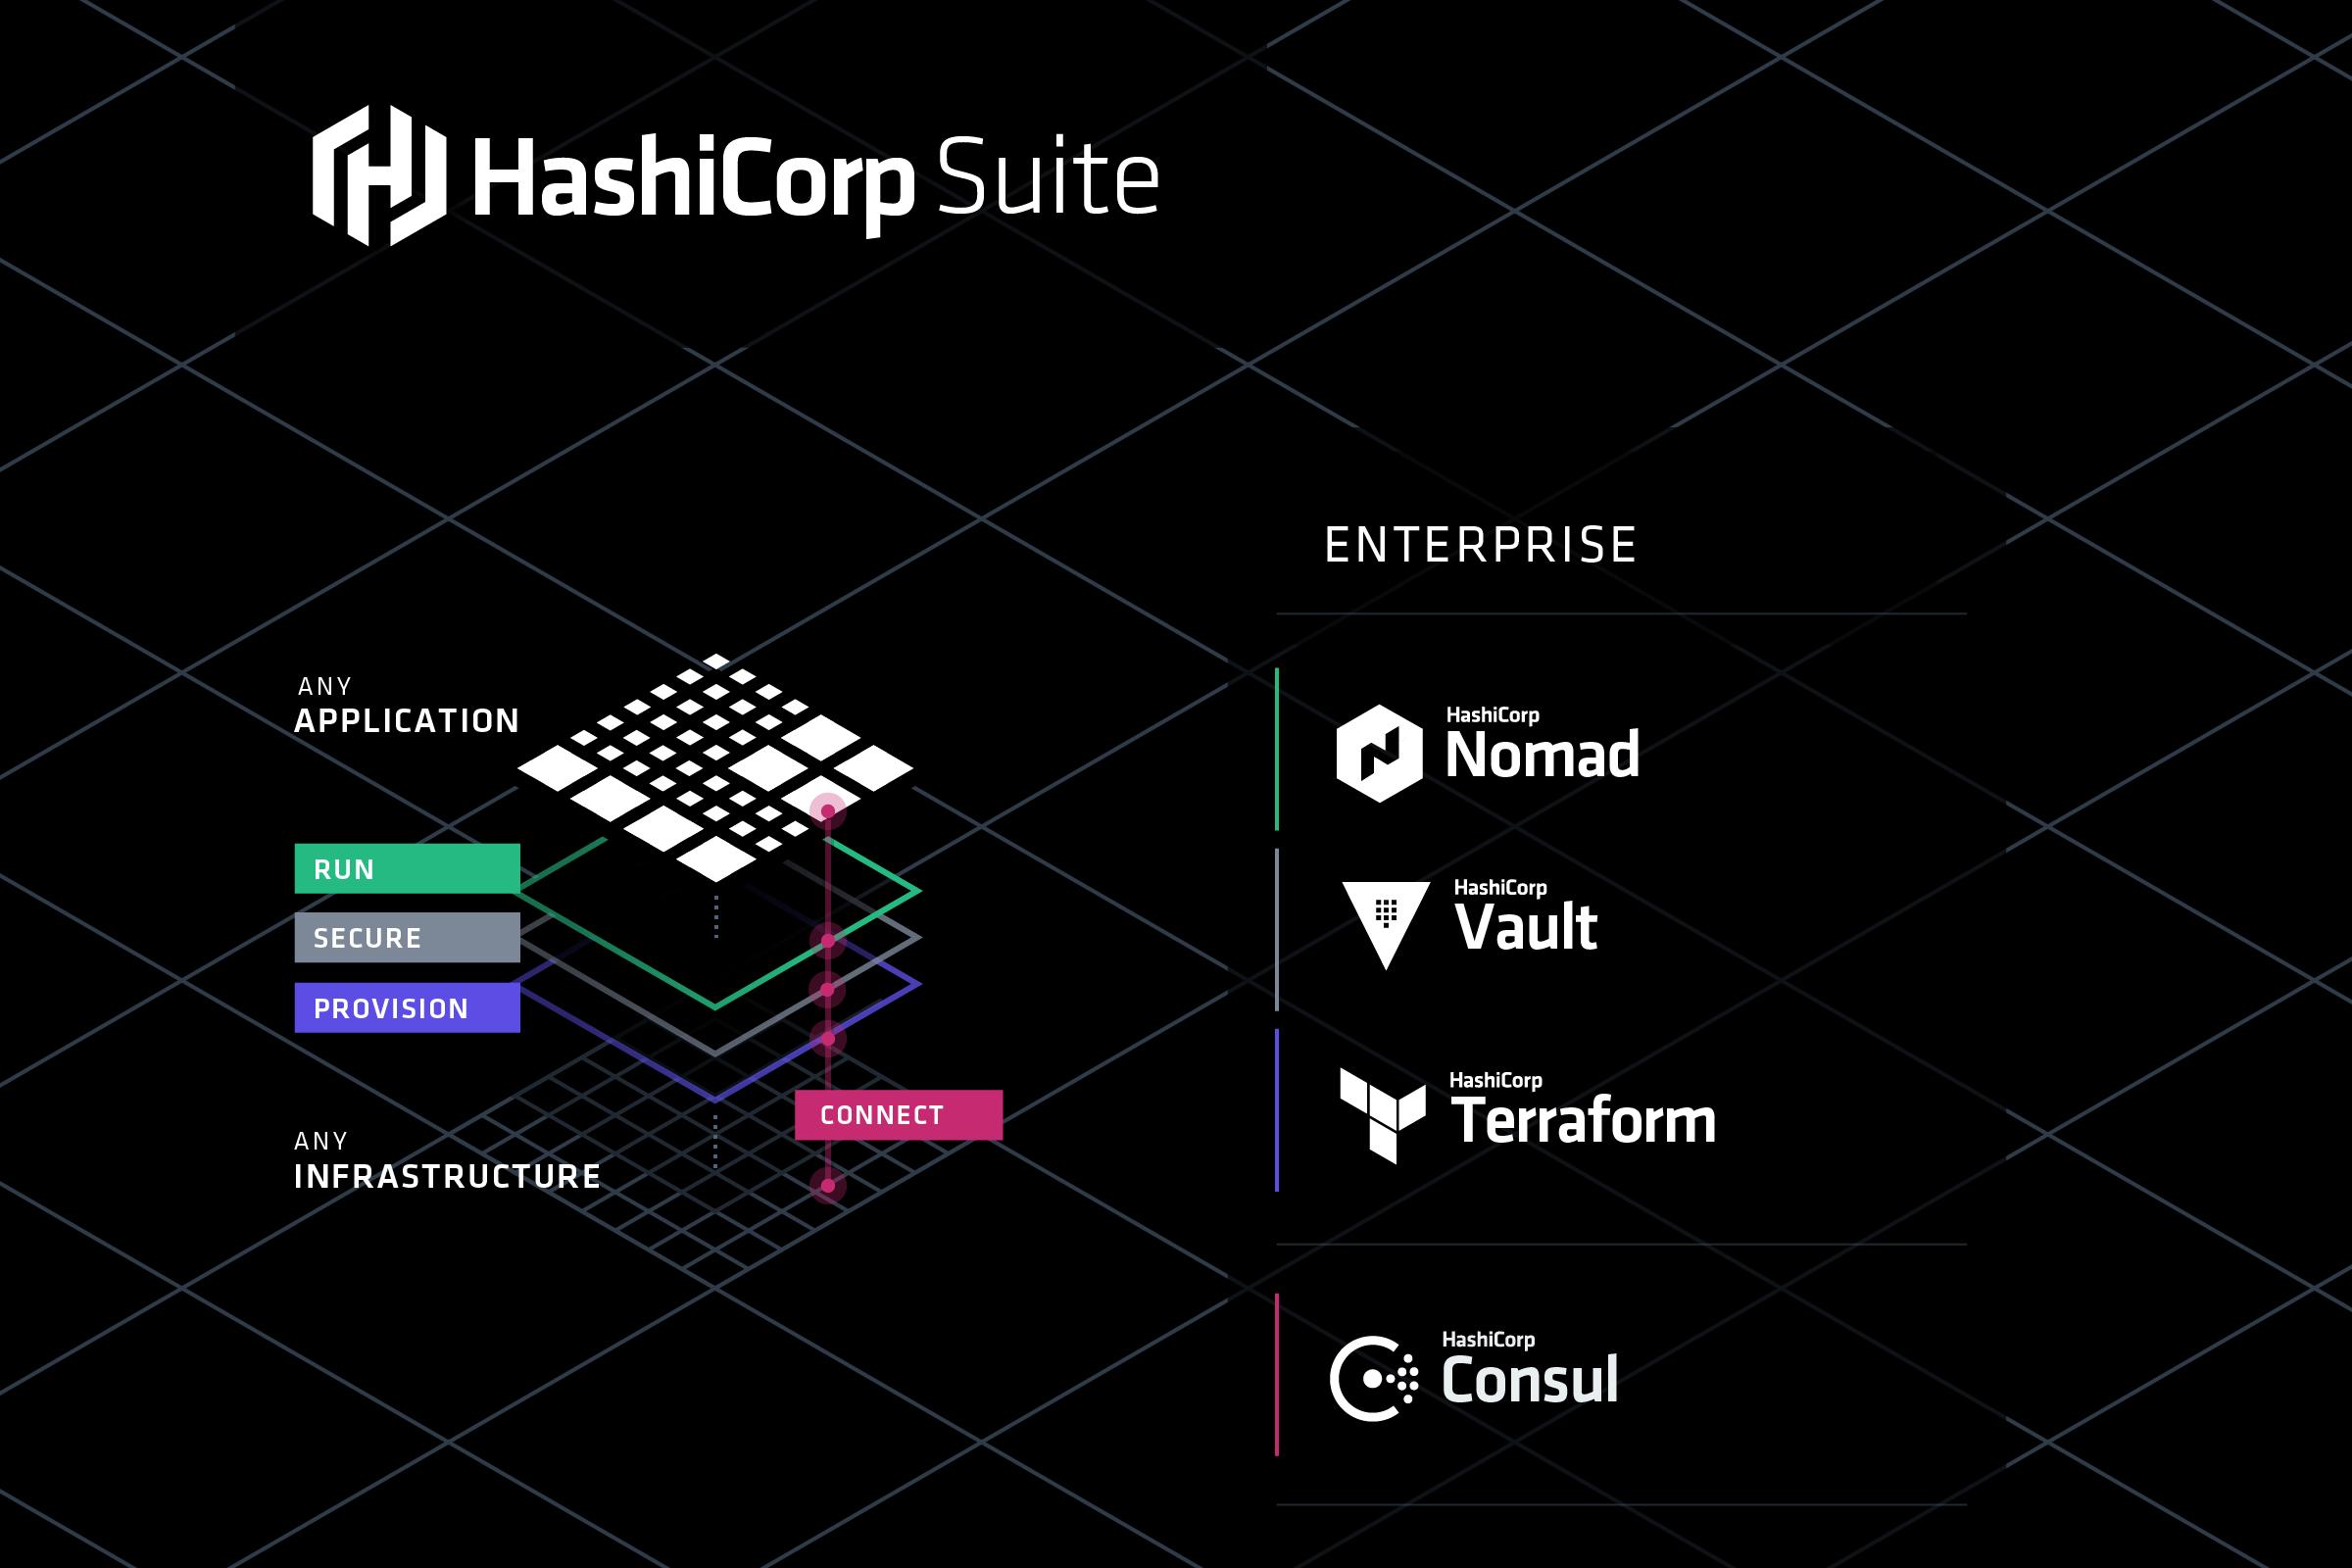 HashiCorp完成4000万美元C轮融资开源狂人建立的云计算自动化公司 云服务 第3张-泥人传说